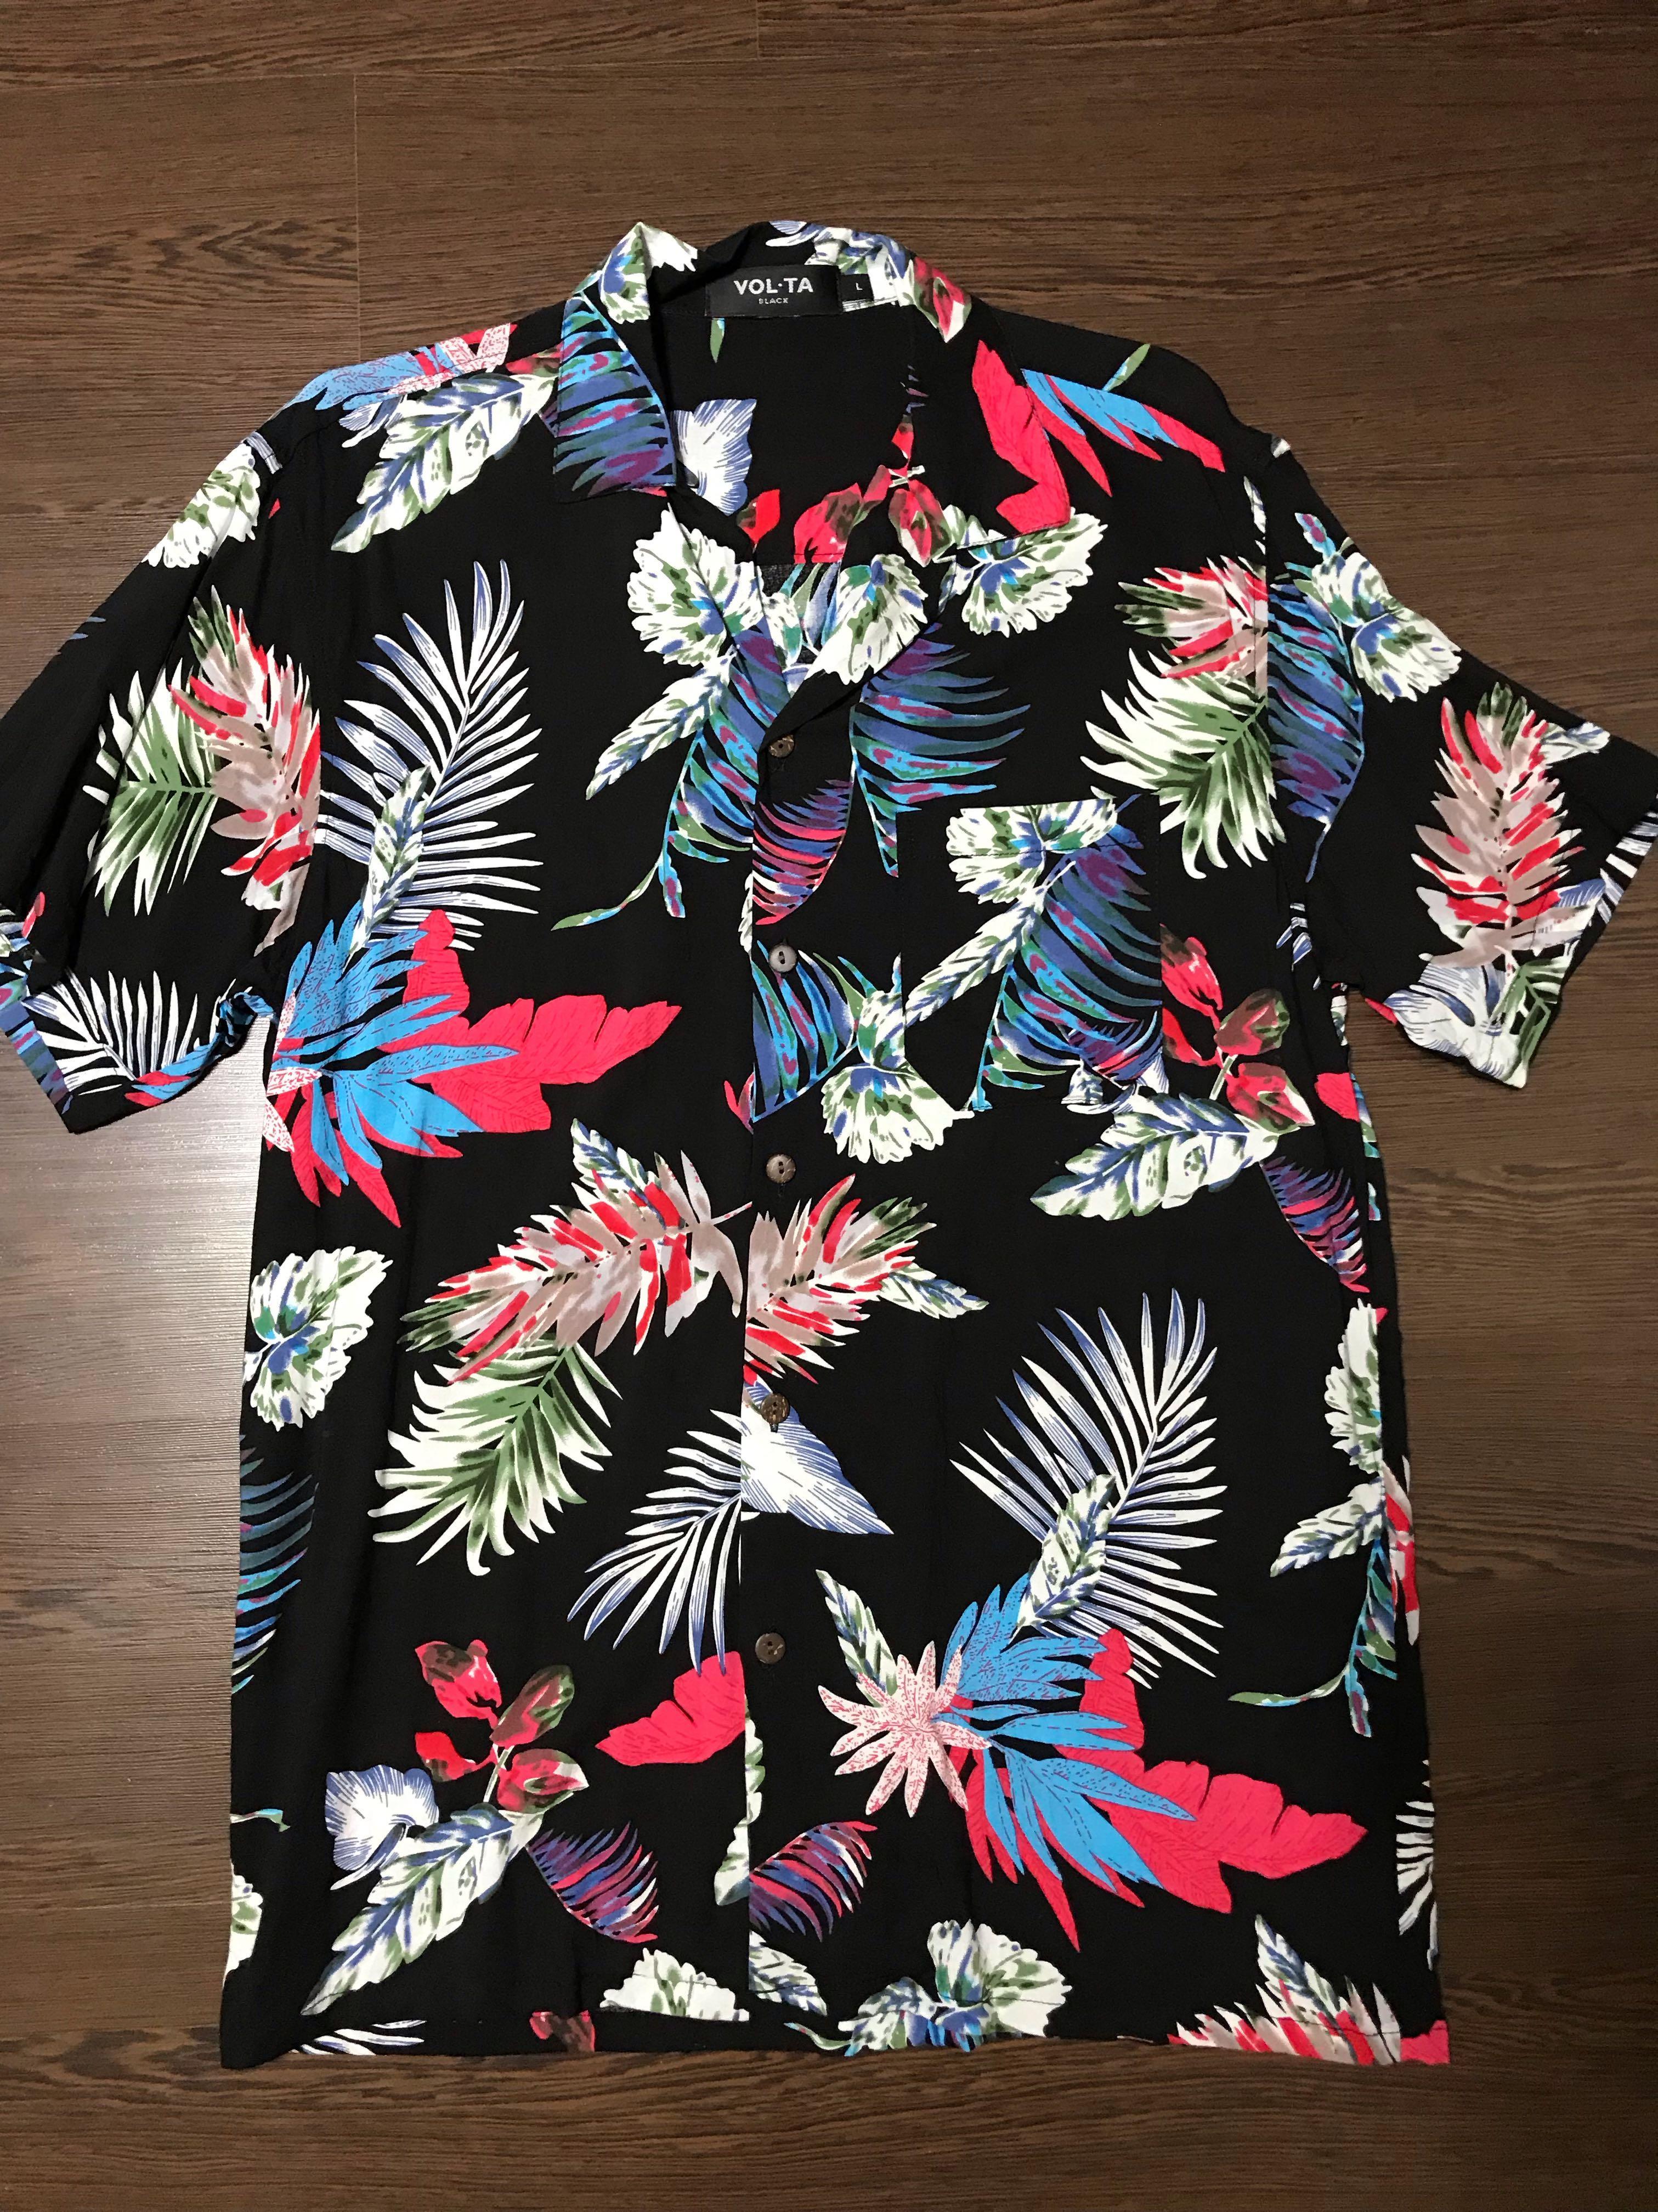 Volta floral shirt